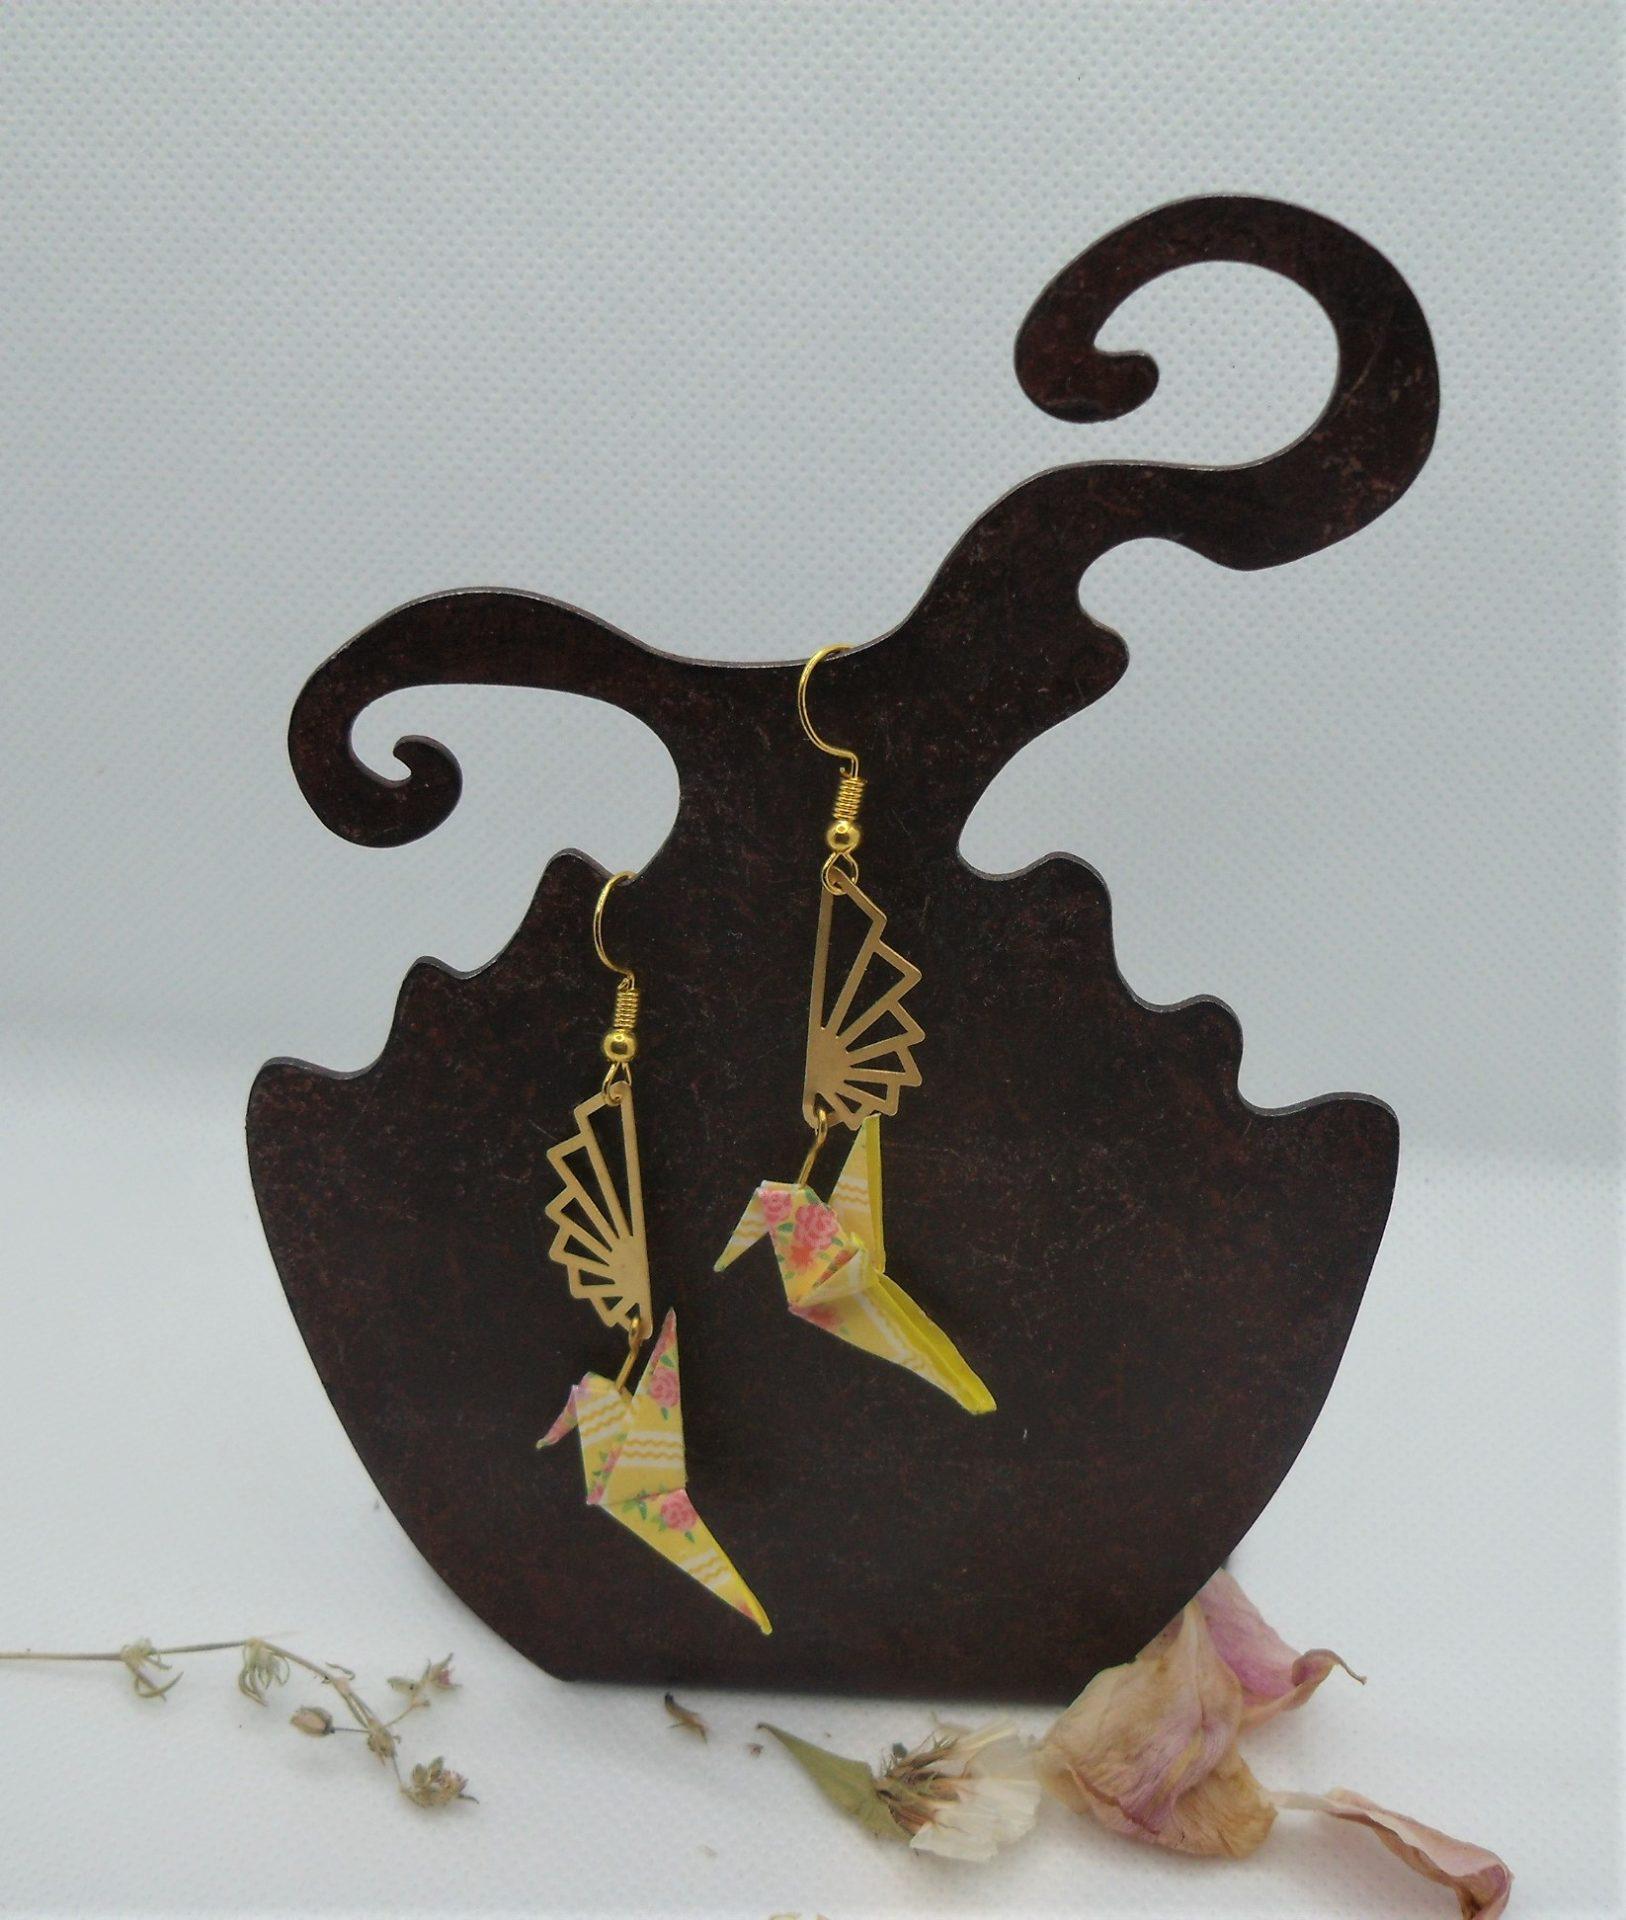 BOOco6 - 25€ - Boucles d'Oreilles Origami colombe - Miskatonic Shop